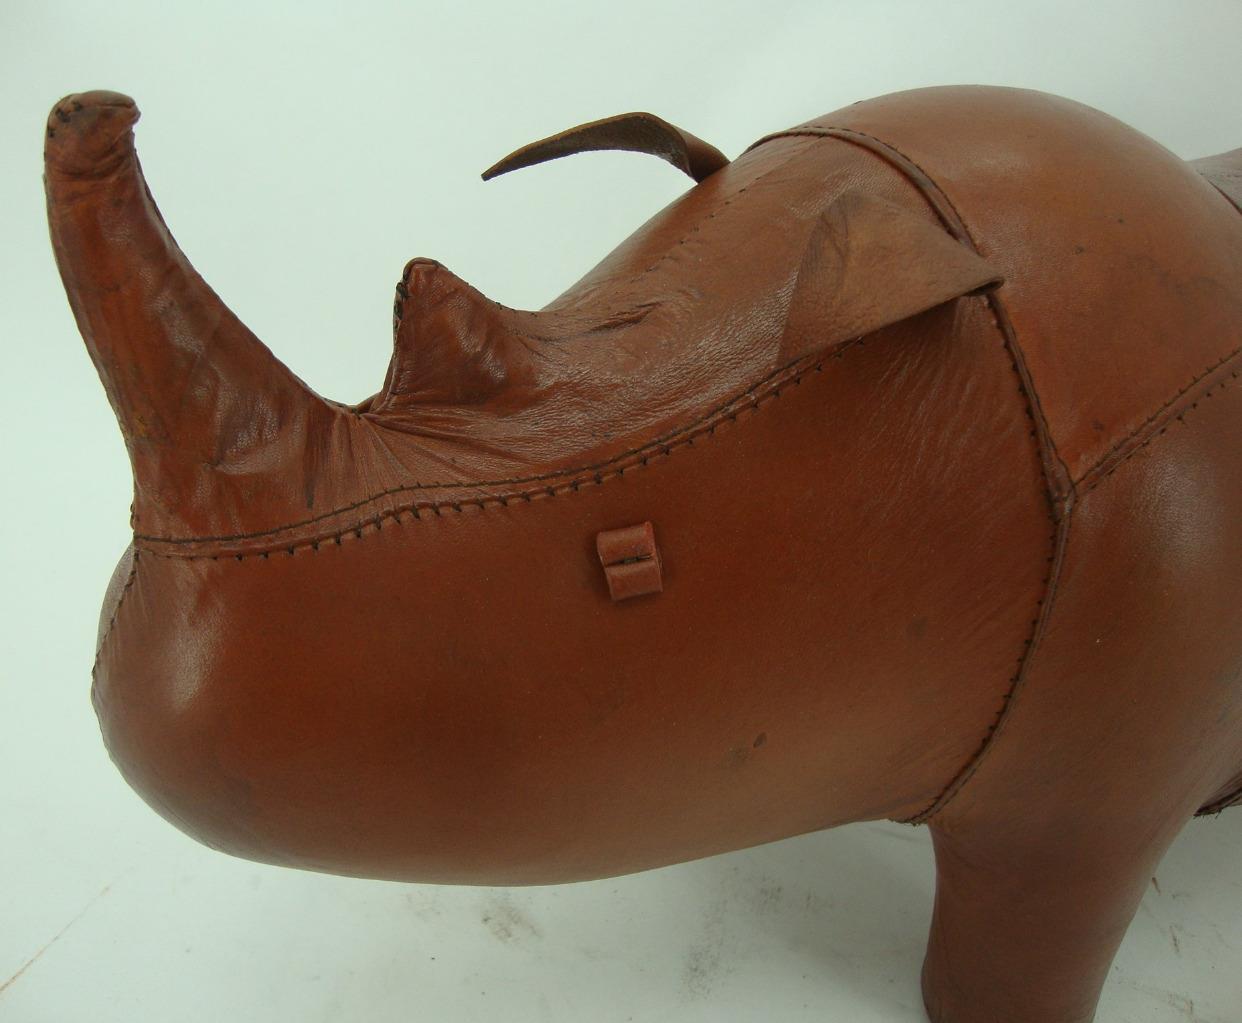 Hecho-a-Mano-Cuero-Genuino-Rhino-Taburete-Reposapies-28cm-X-56cm miniatura 4